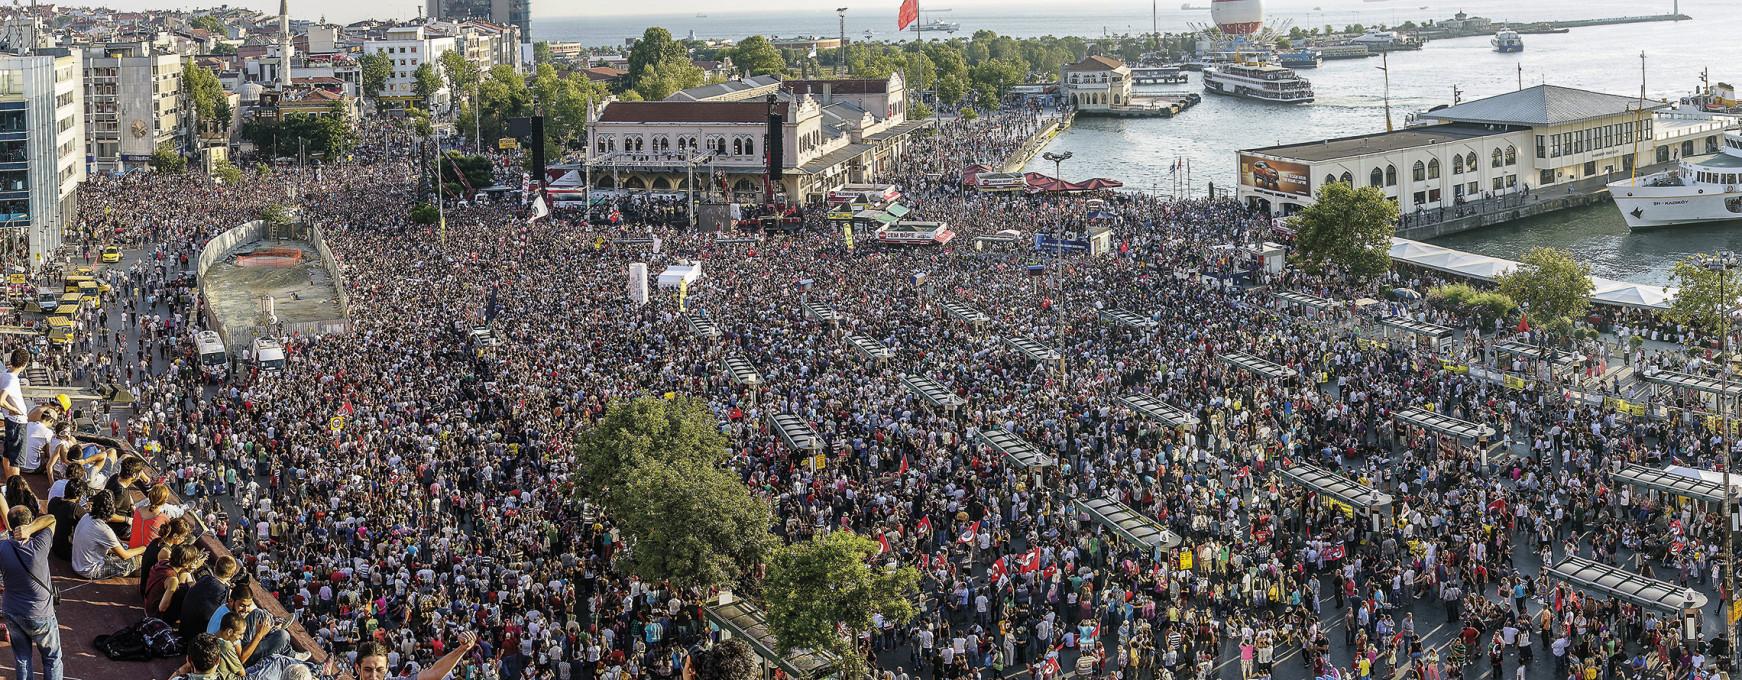 Glasbeni festival Gasman, Kadikoy, Istanbul, protest za park Gezi, 7. julij 2013.